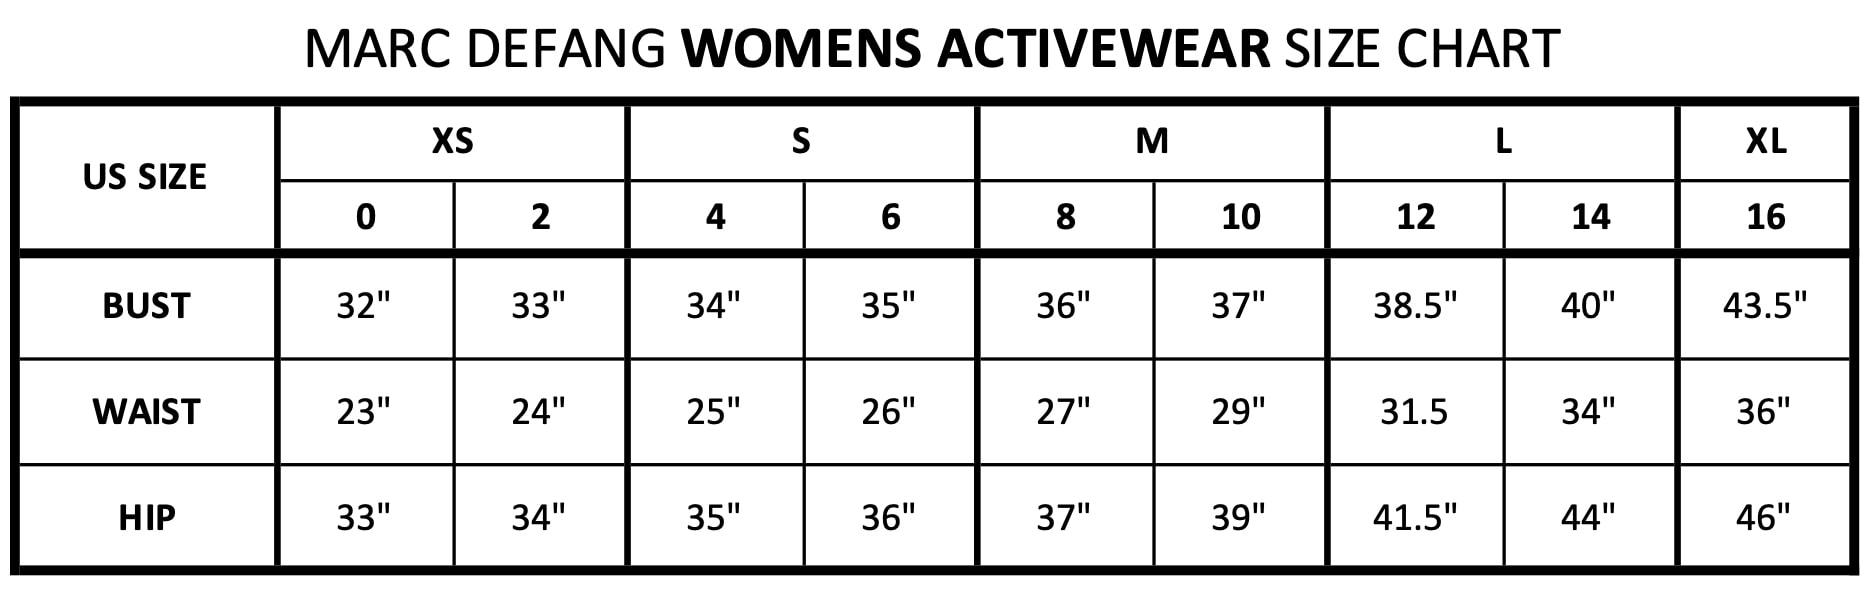 size-women-active-min.jpg